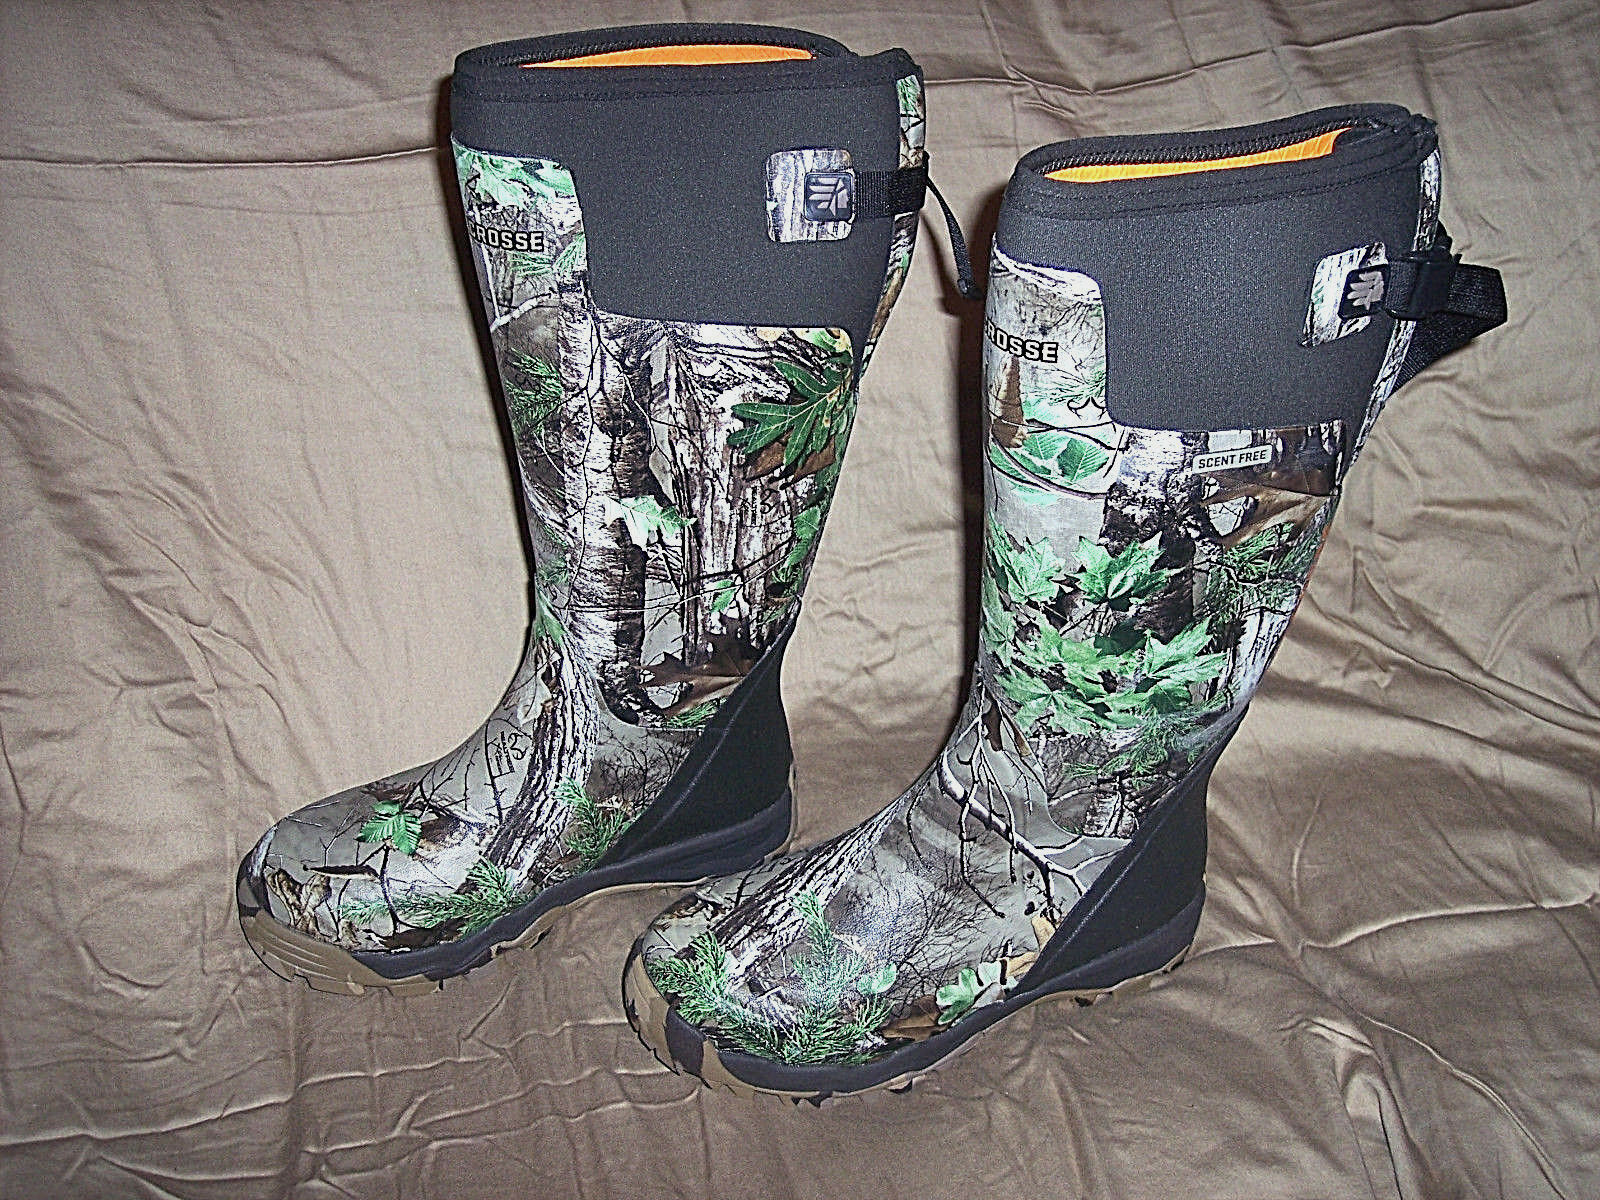 LaCrosse Pro Stiefel Camo Hunting Stiefel Scent Free Waterproof Herren Sz 8 Camo Stiefel